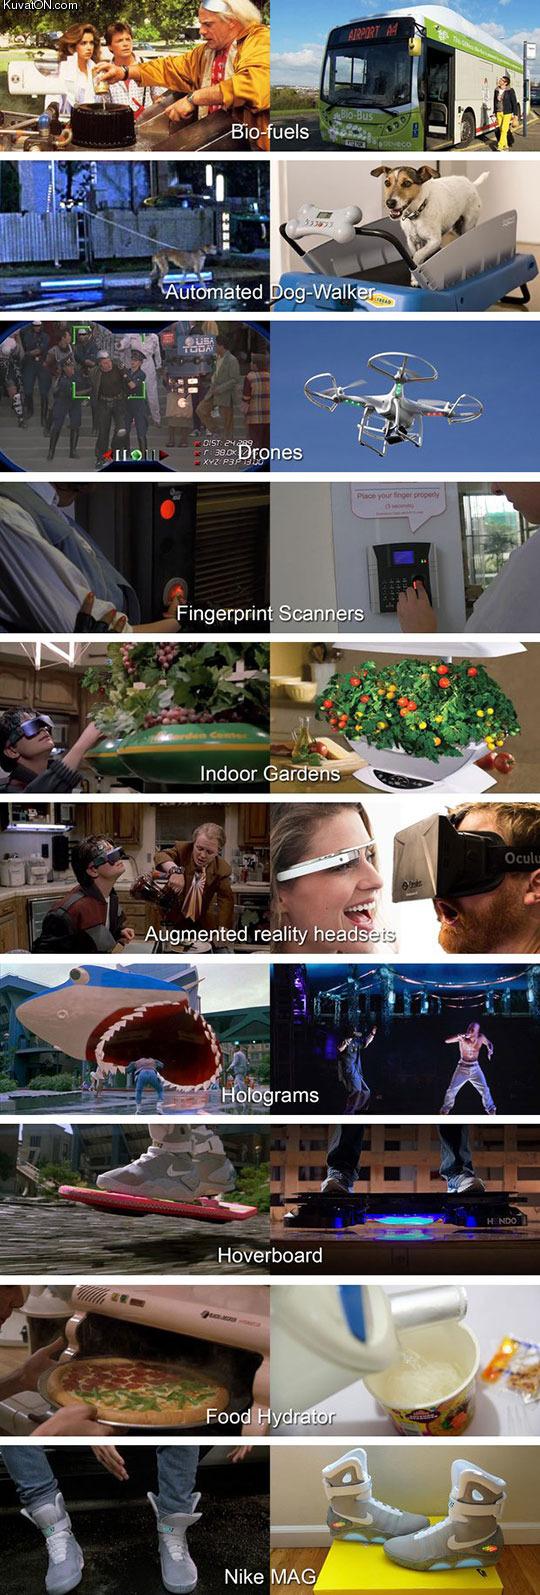 back_to_the_future_ii_vs_reality_in_2015.jpg